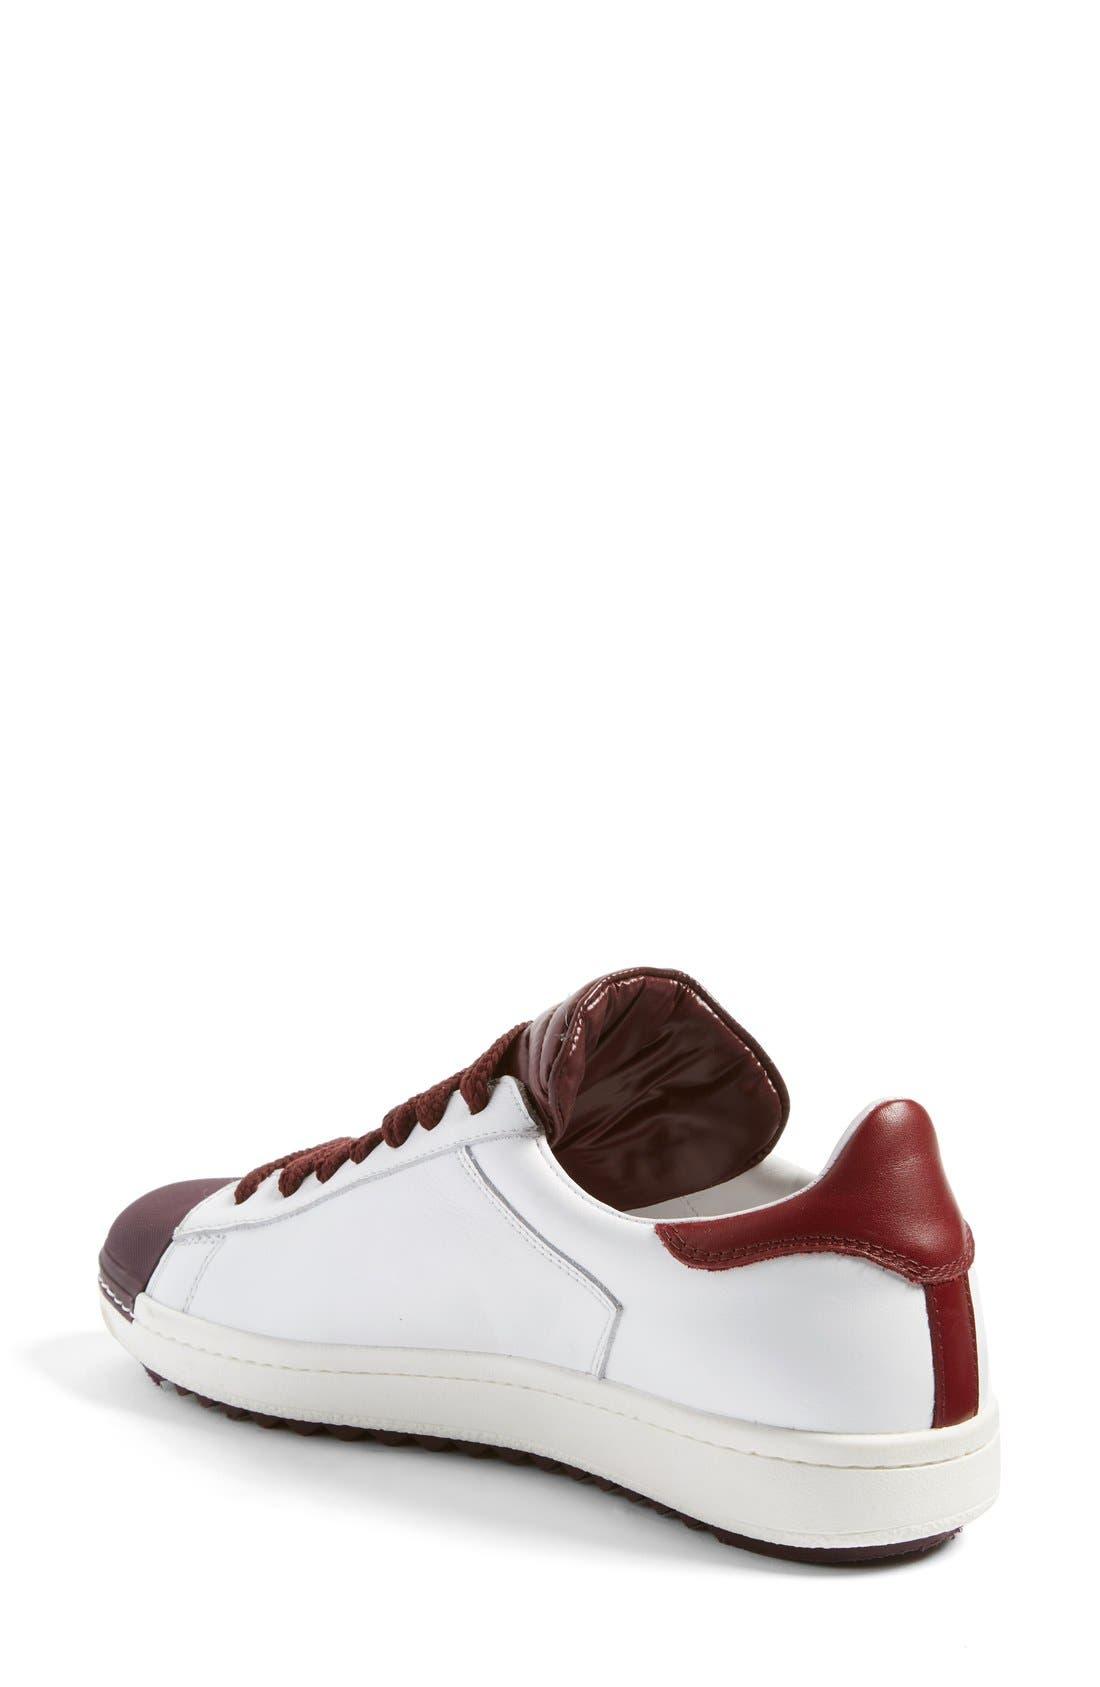 'Angeline Scarpa' Sneaker,                             Alternate thumbnail 10, color,